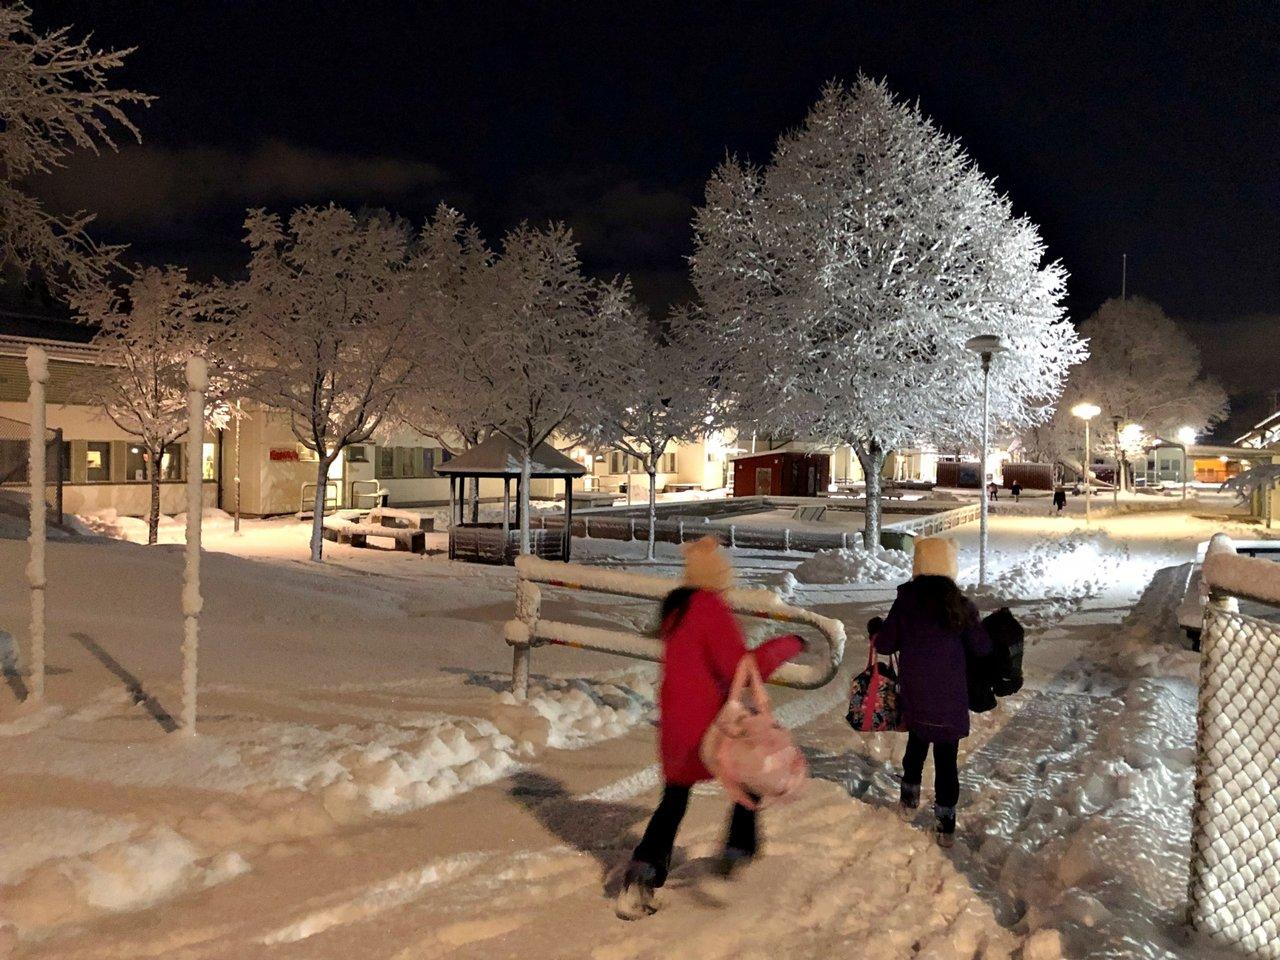 Dianalamadre-sweden-snow